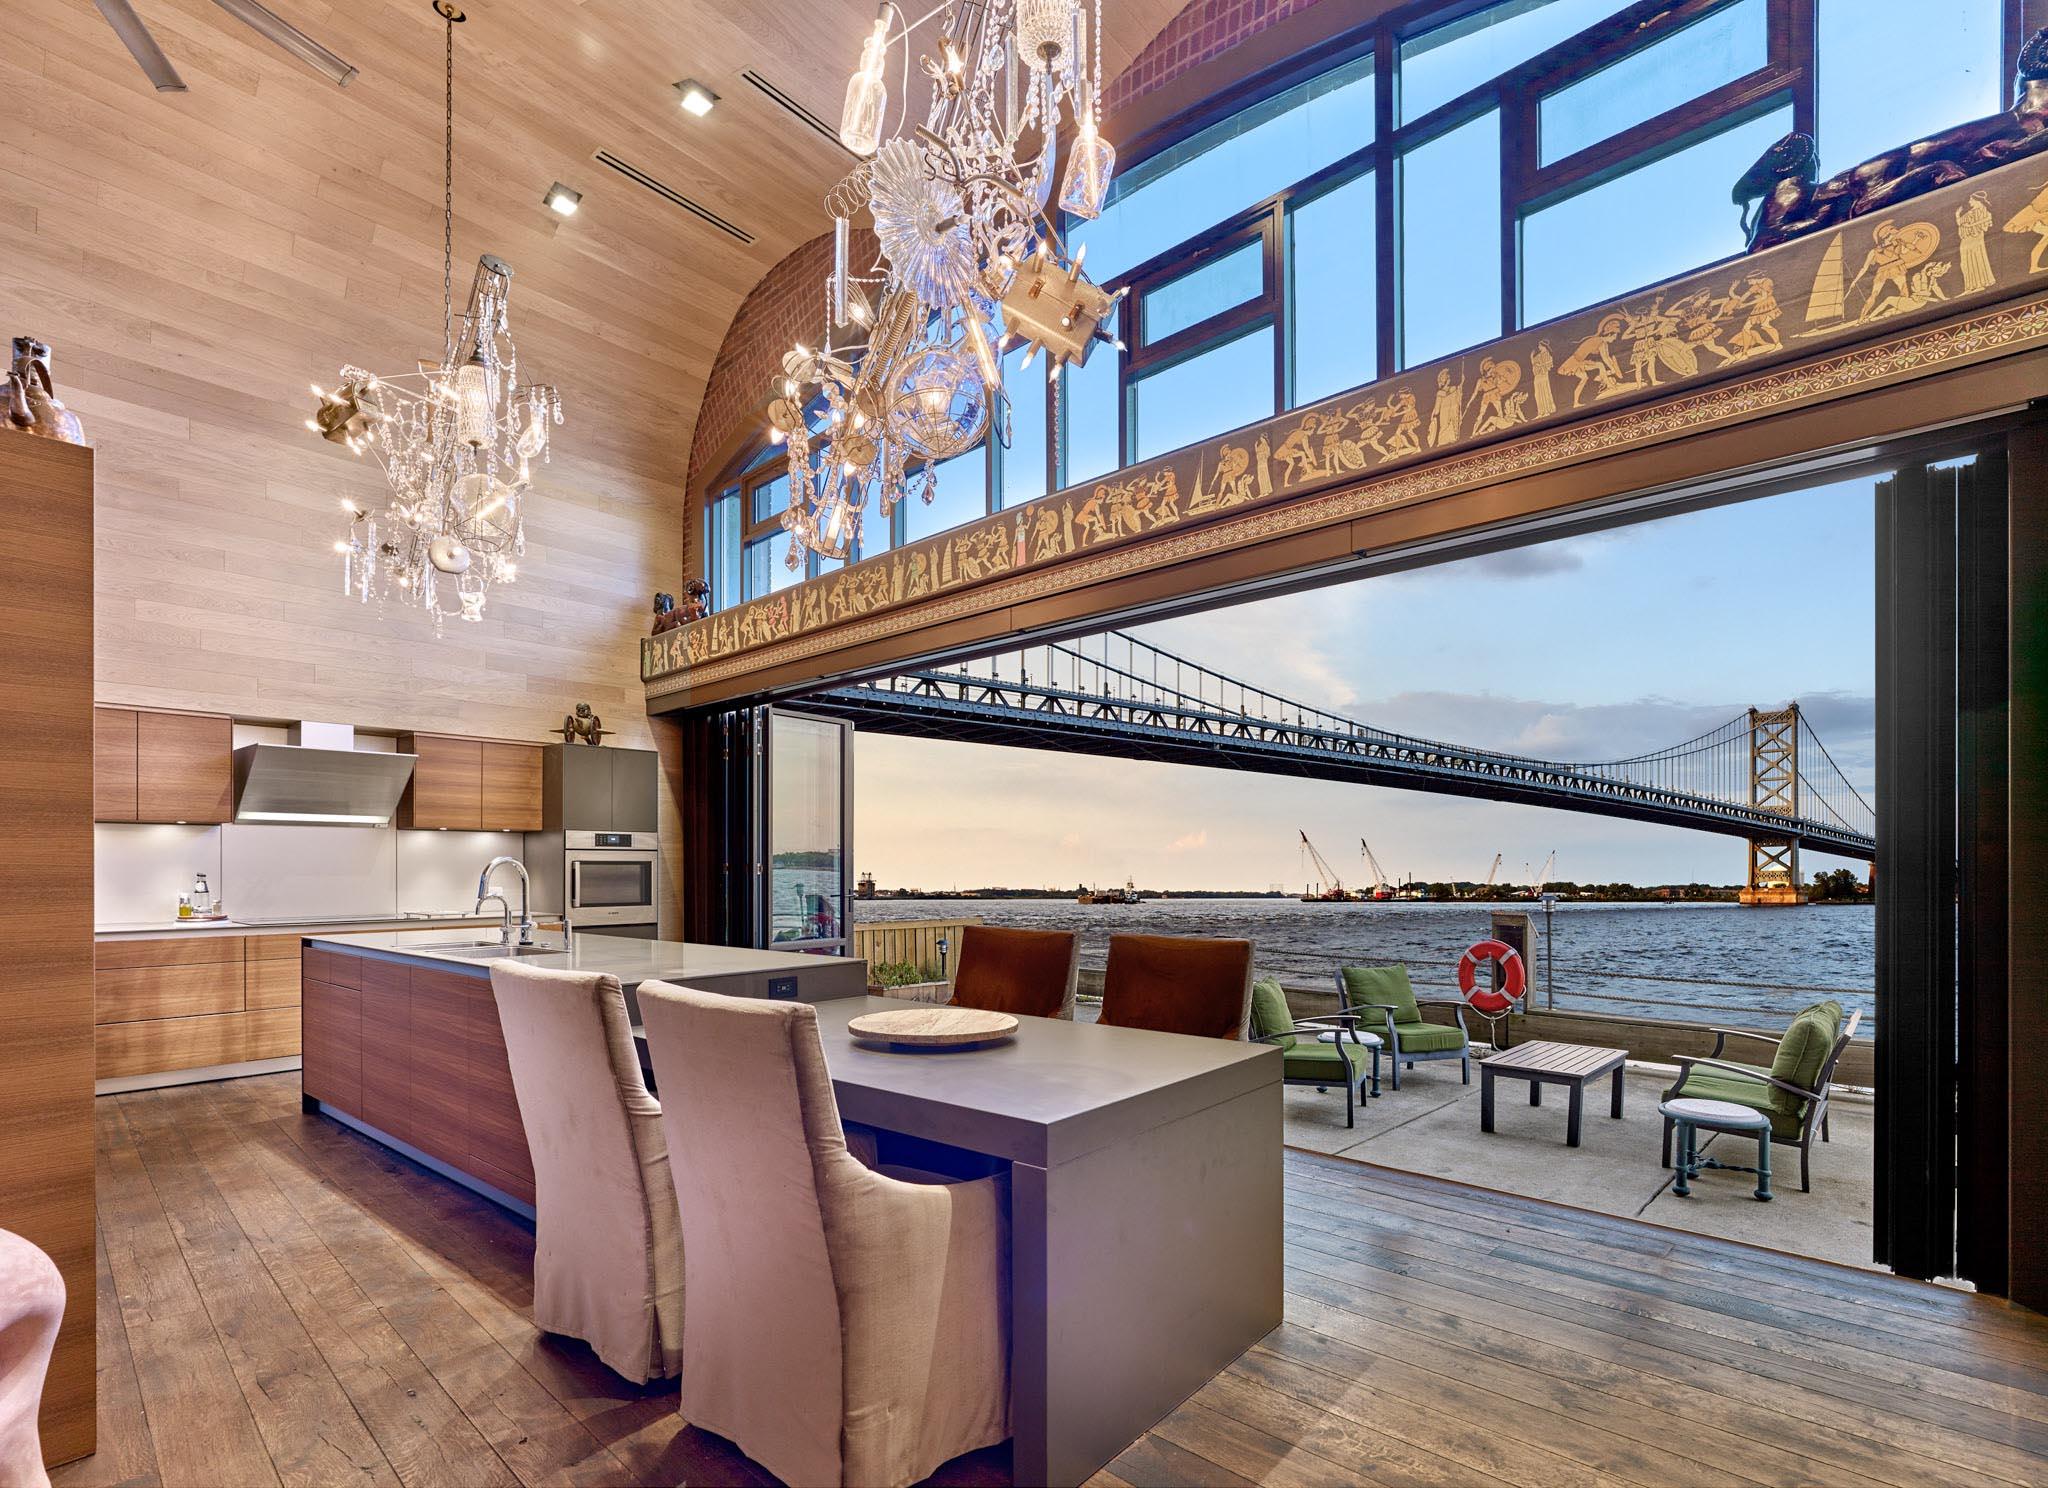 grand philadelphia kitchen with bridge view through opening glass wall